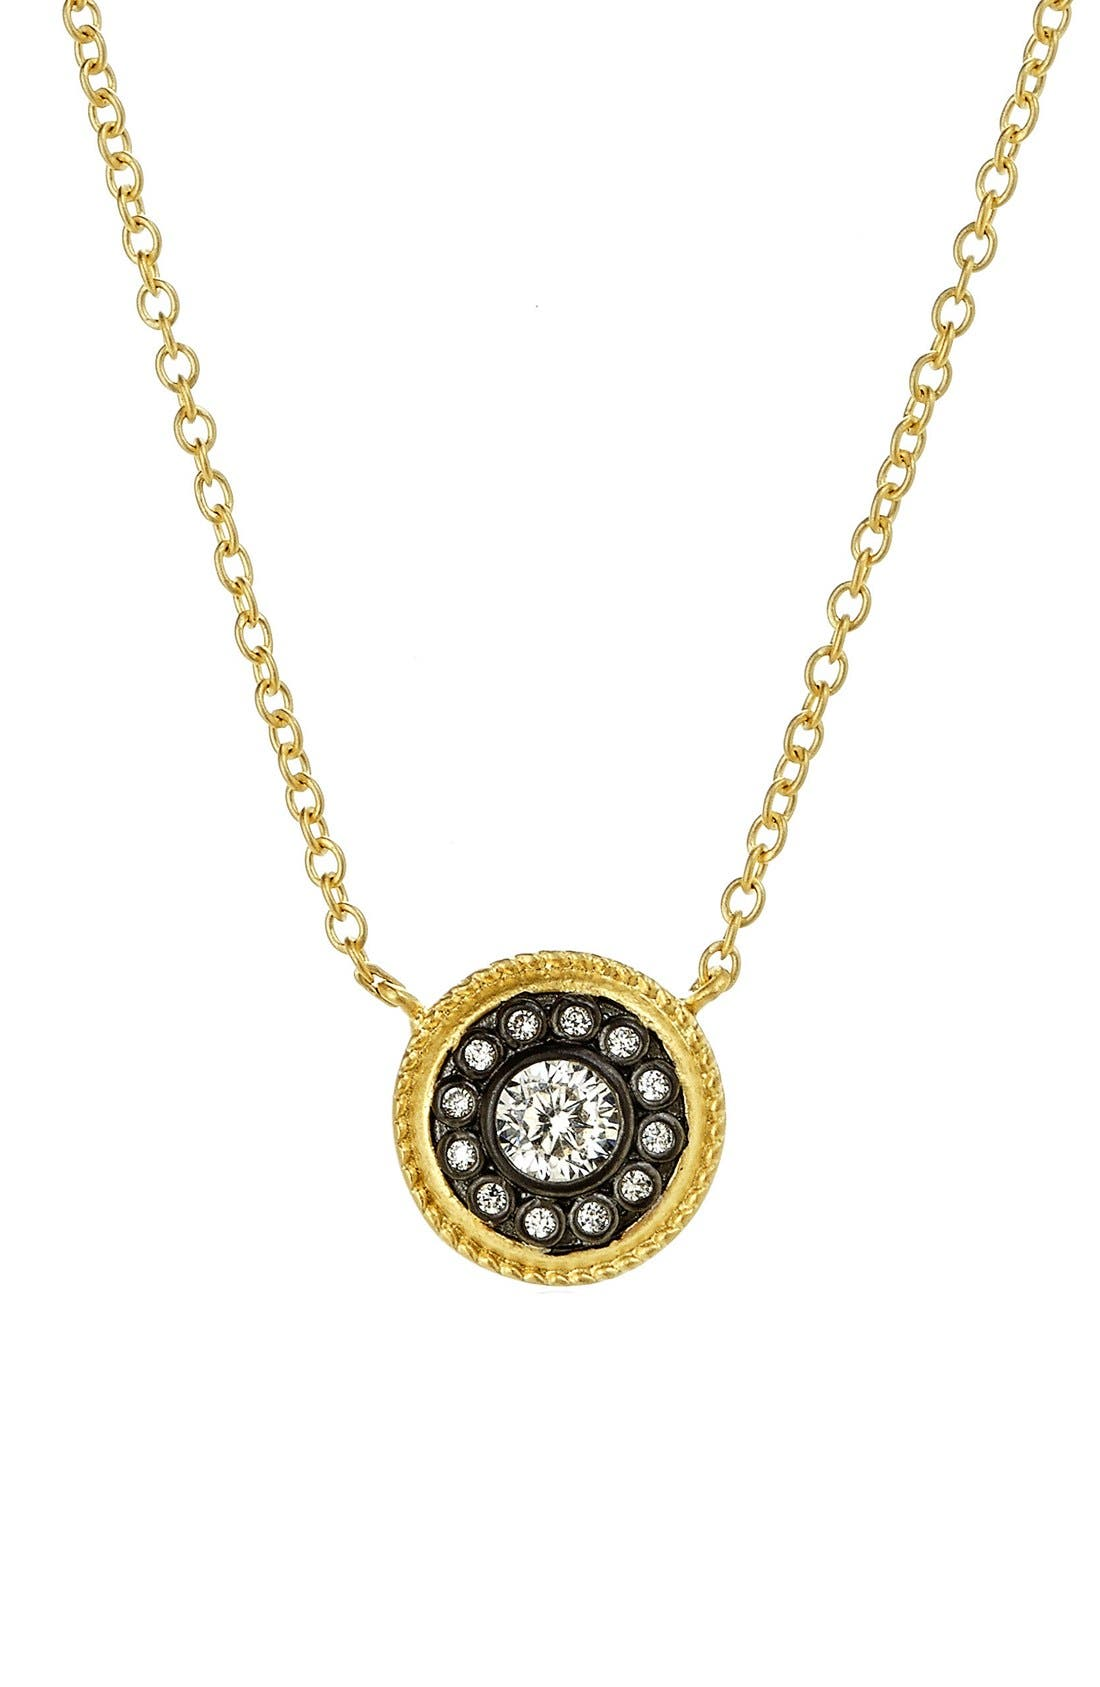 FREIDA ROTHMAN Hamptons Nautical Button Pendant Necklace